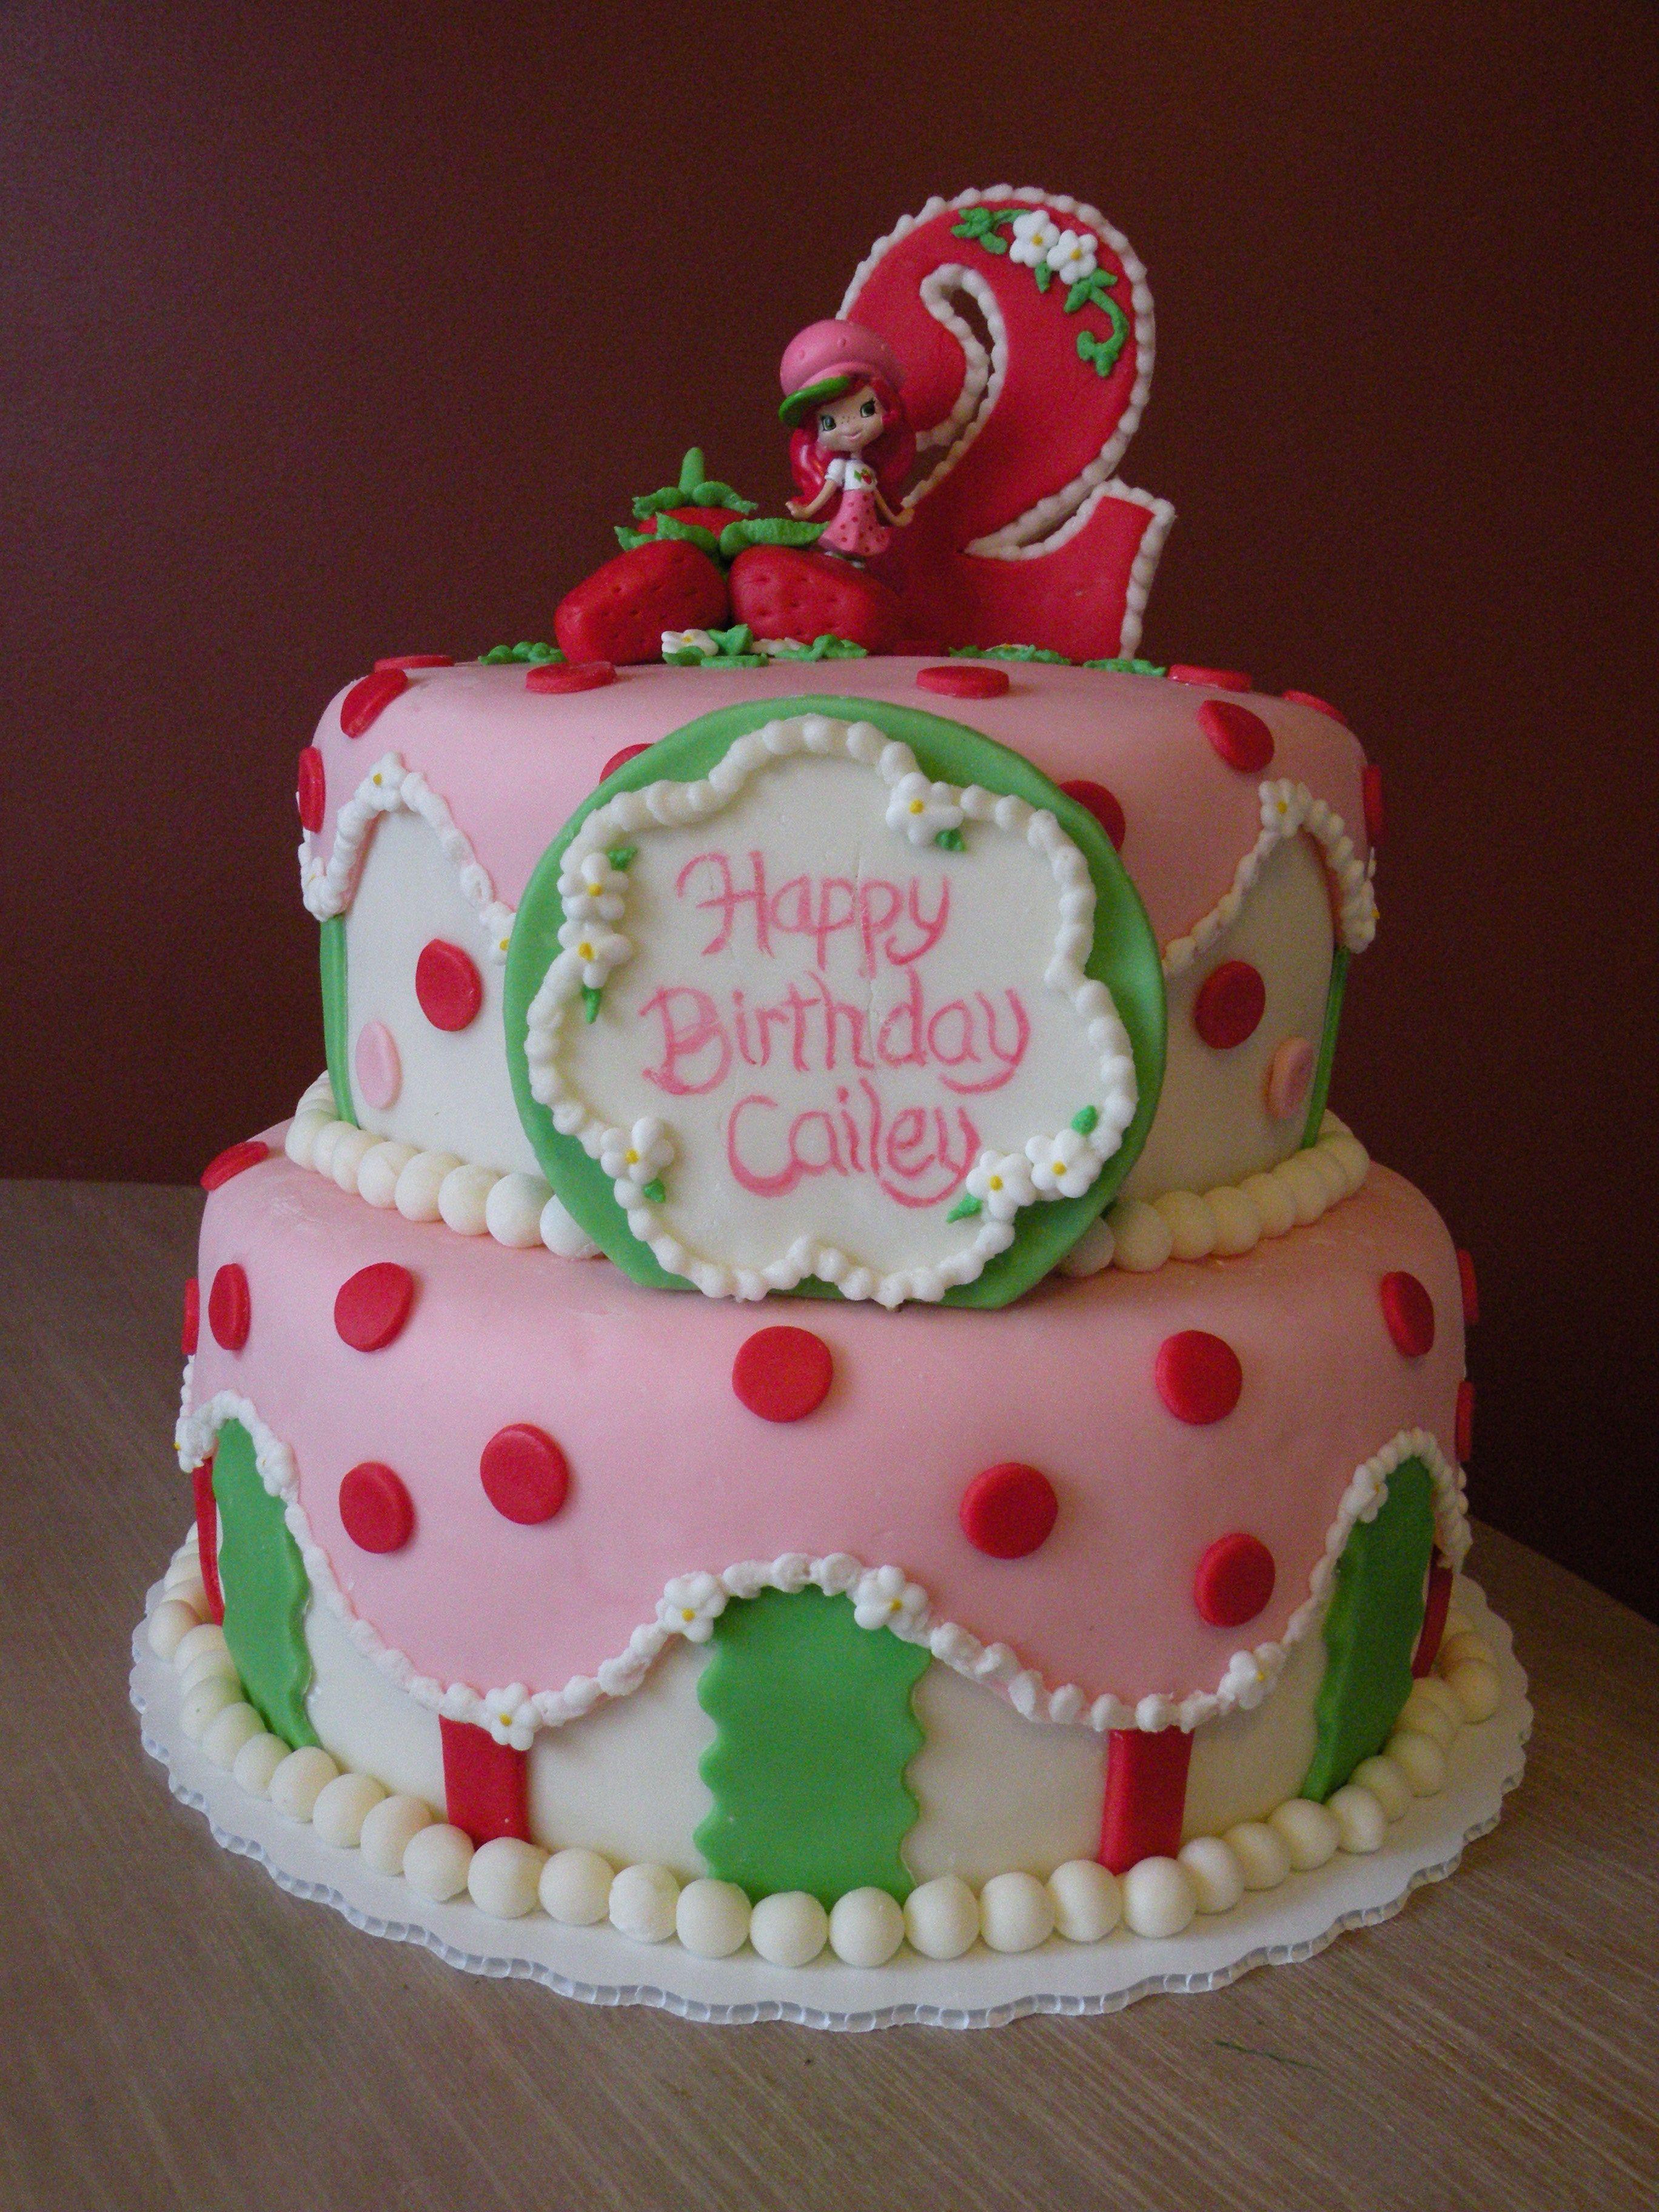 Marvelous Strawberry Shortcake Birthday Cake Strawberry Shortcake Birthday Personalised Birthday Cards Veneteletsinfo